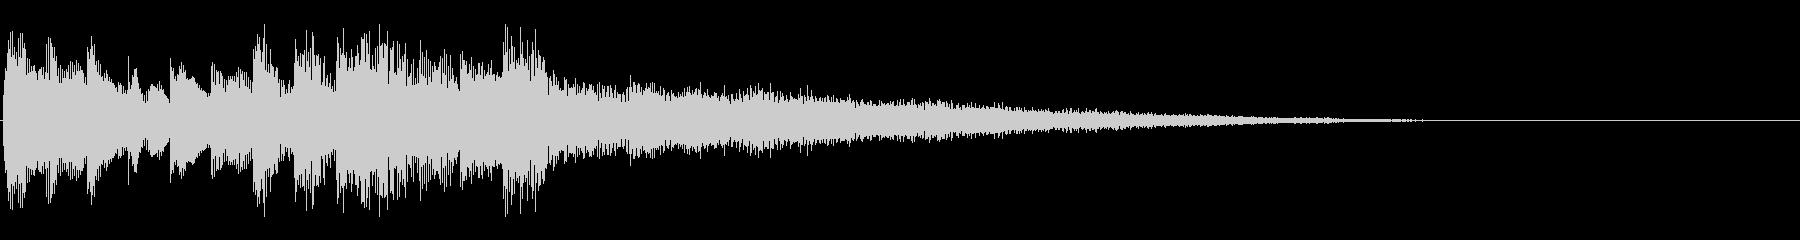 KANT電子音と弦楽器によるジングルの未再生の波形